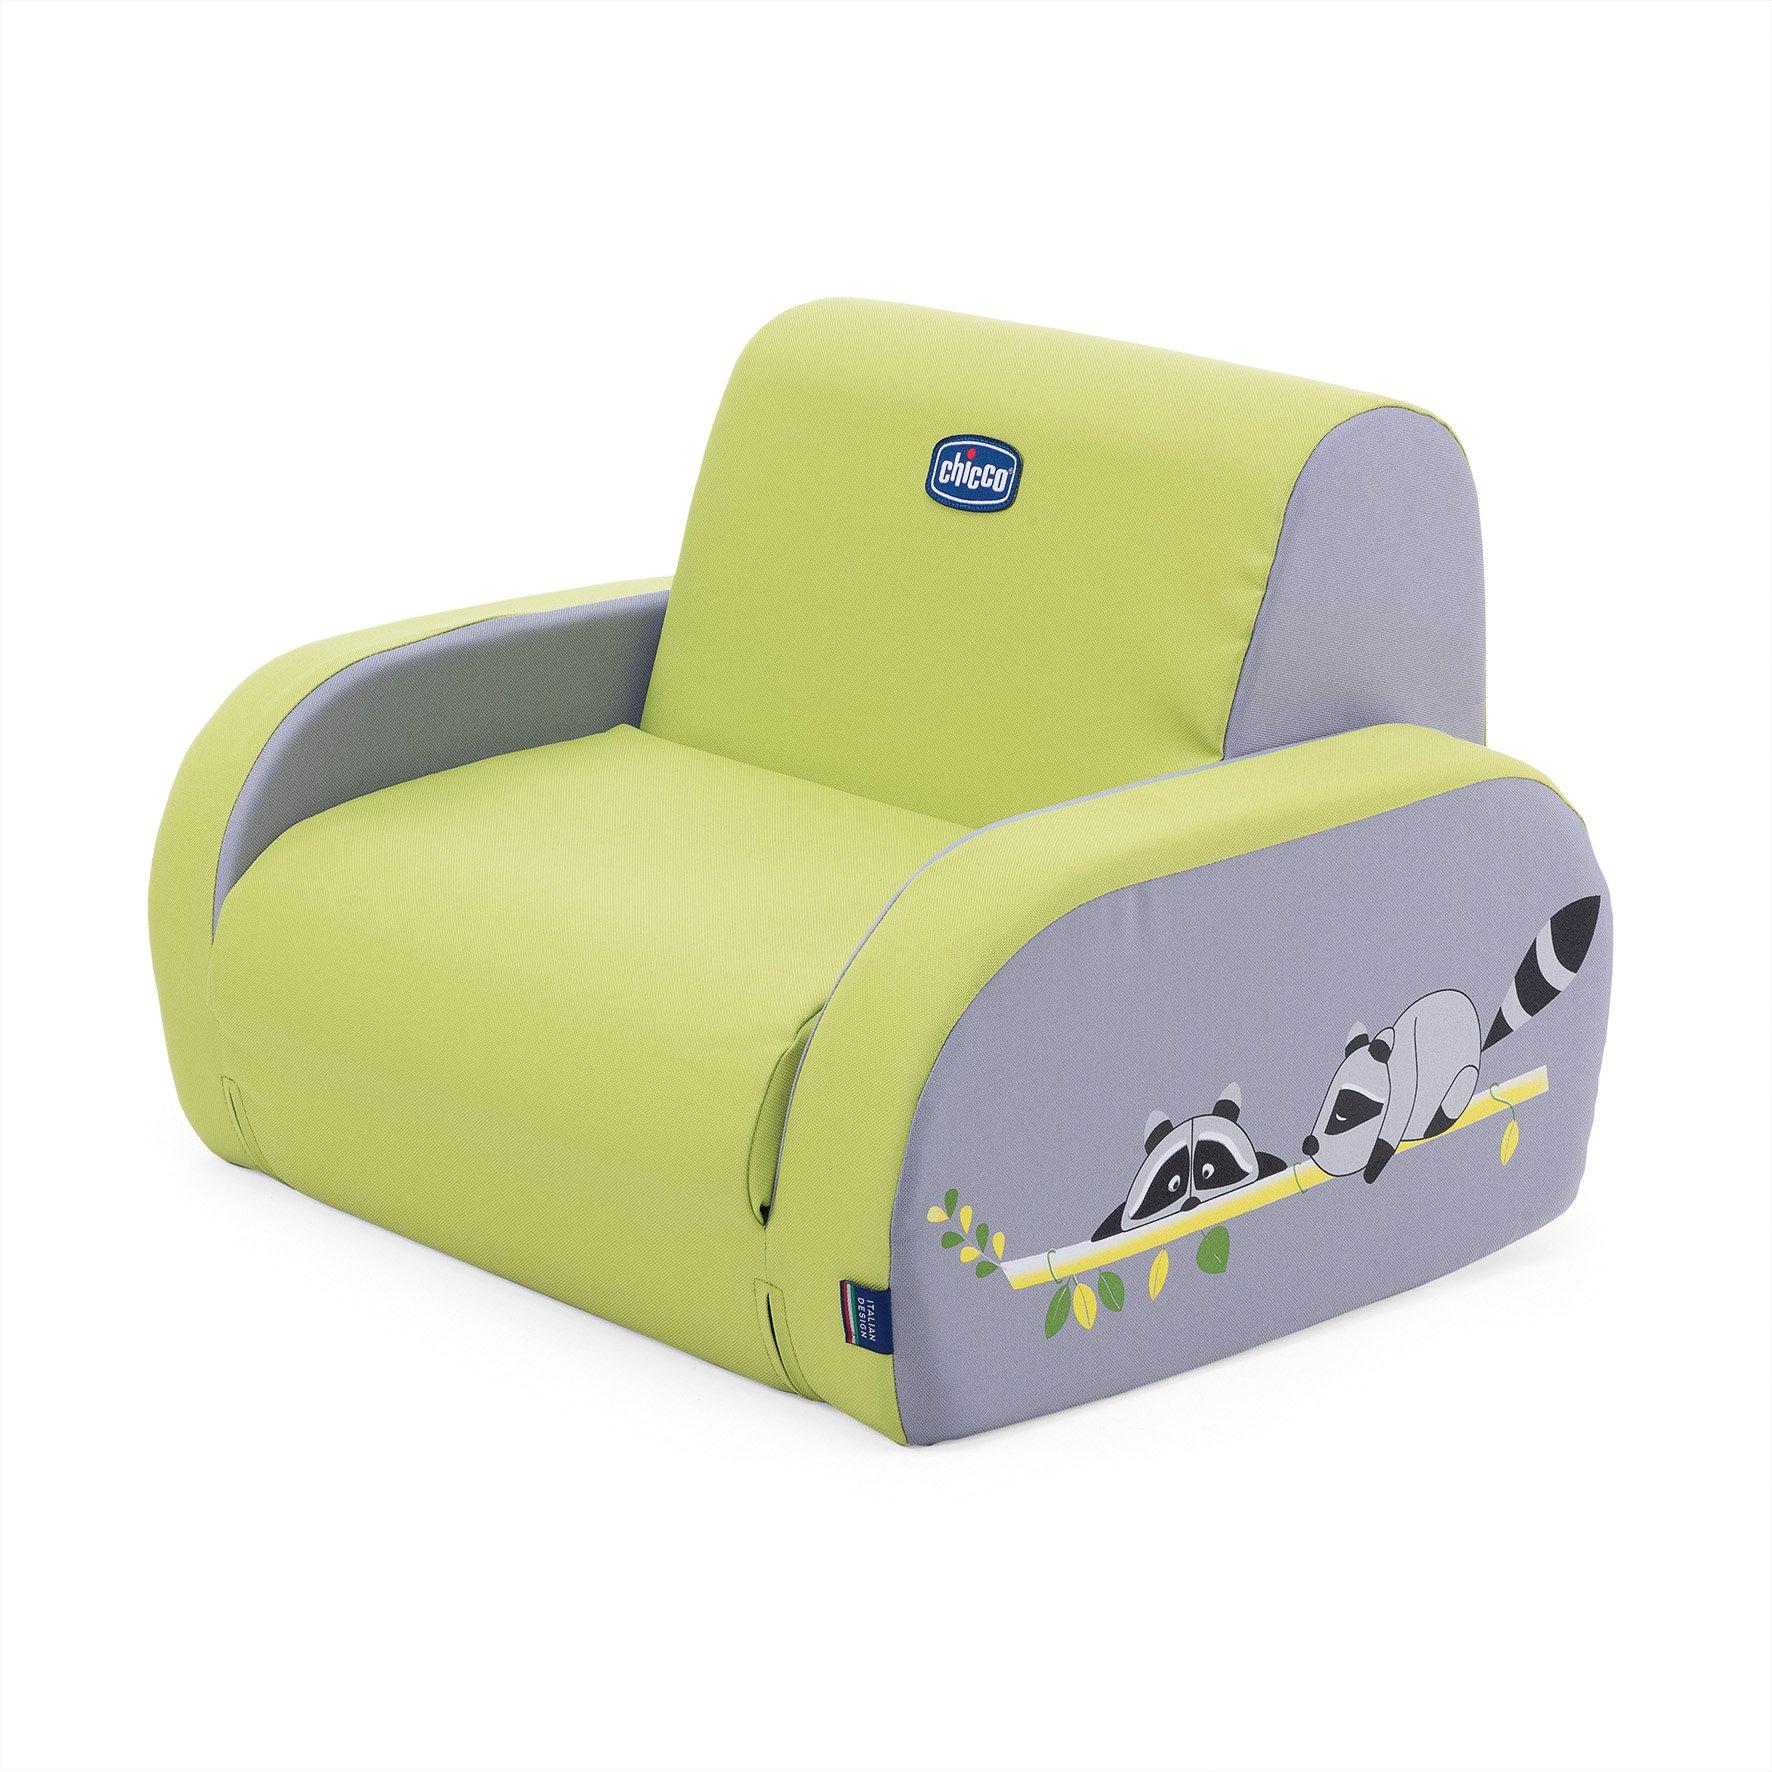 Chicco Baby Armchair Twist 2020 HONEY-BEAR - Buy at ...